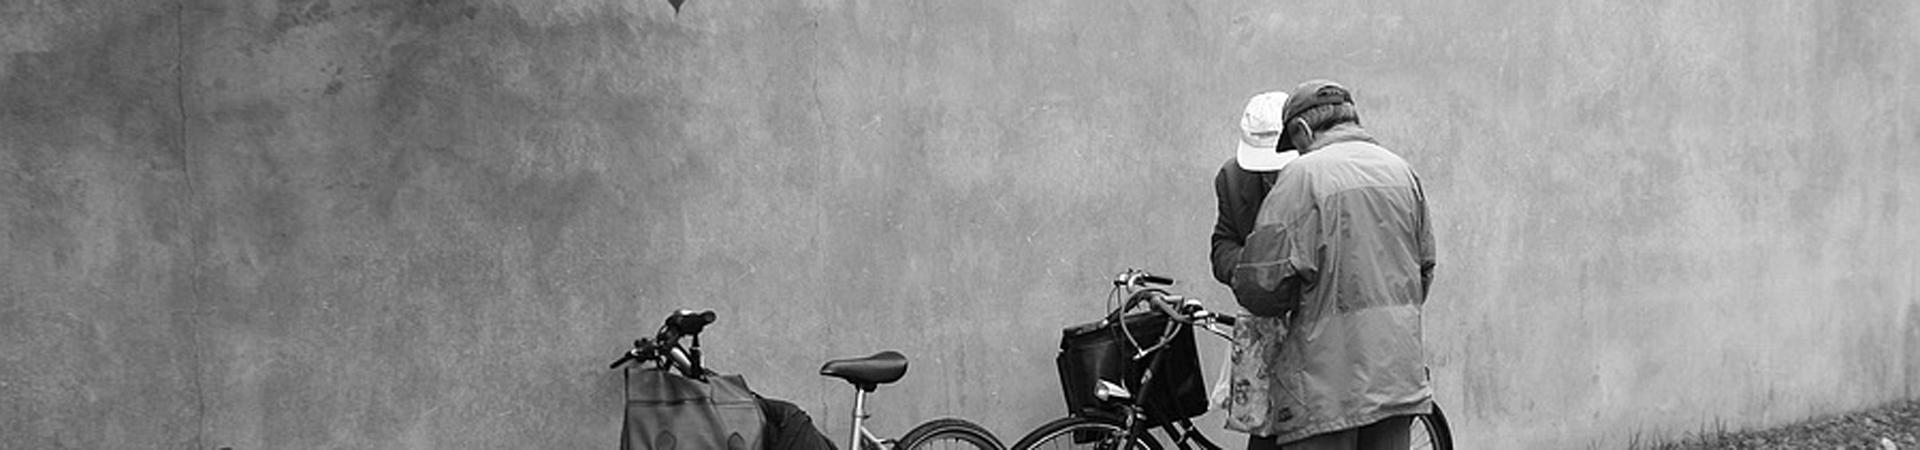 A-kolesarji